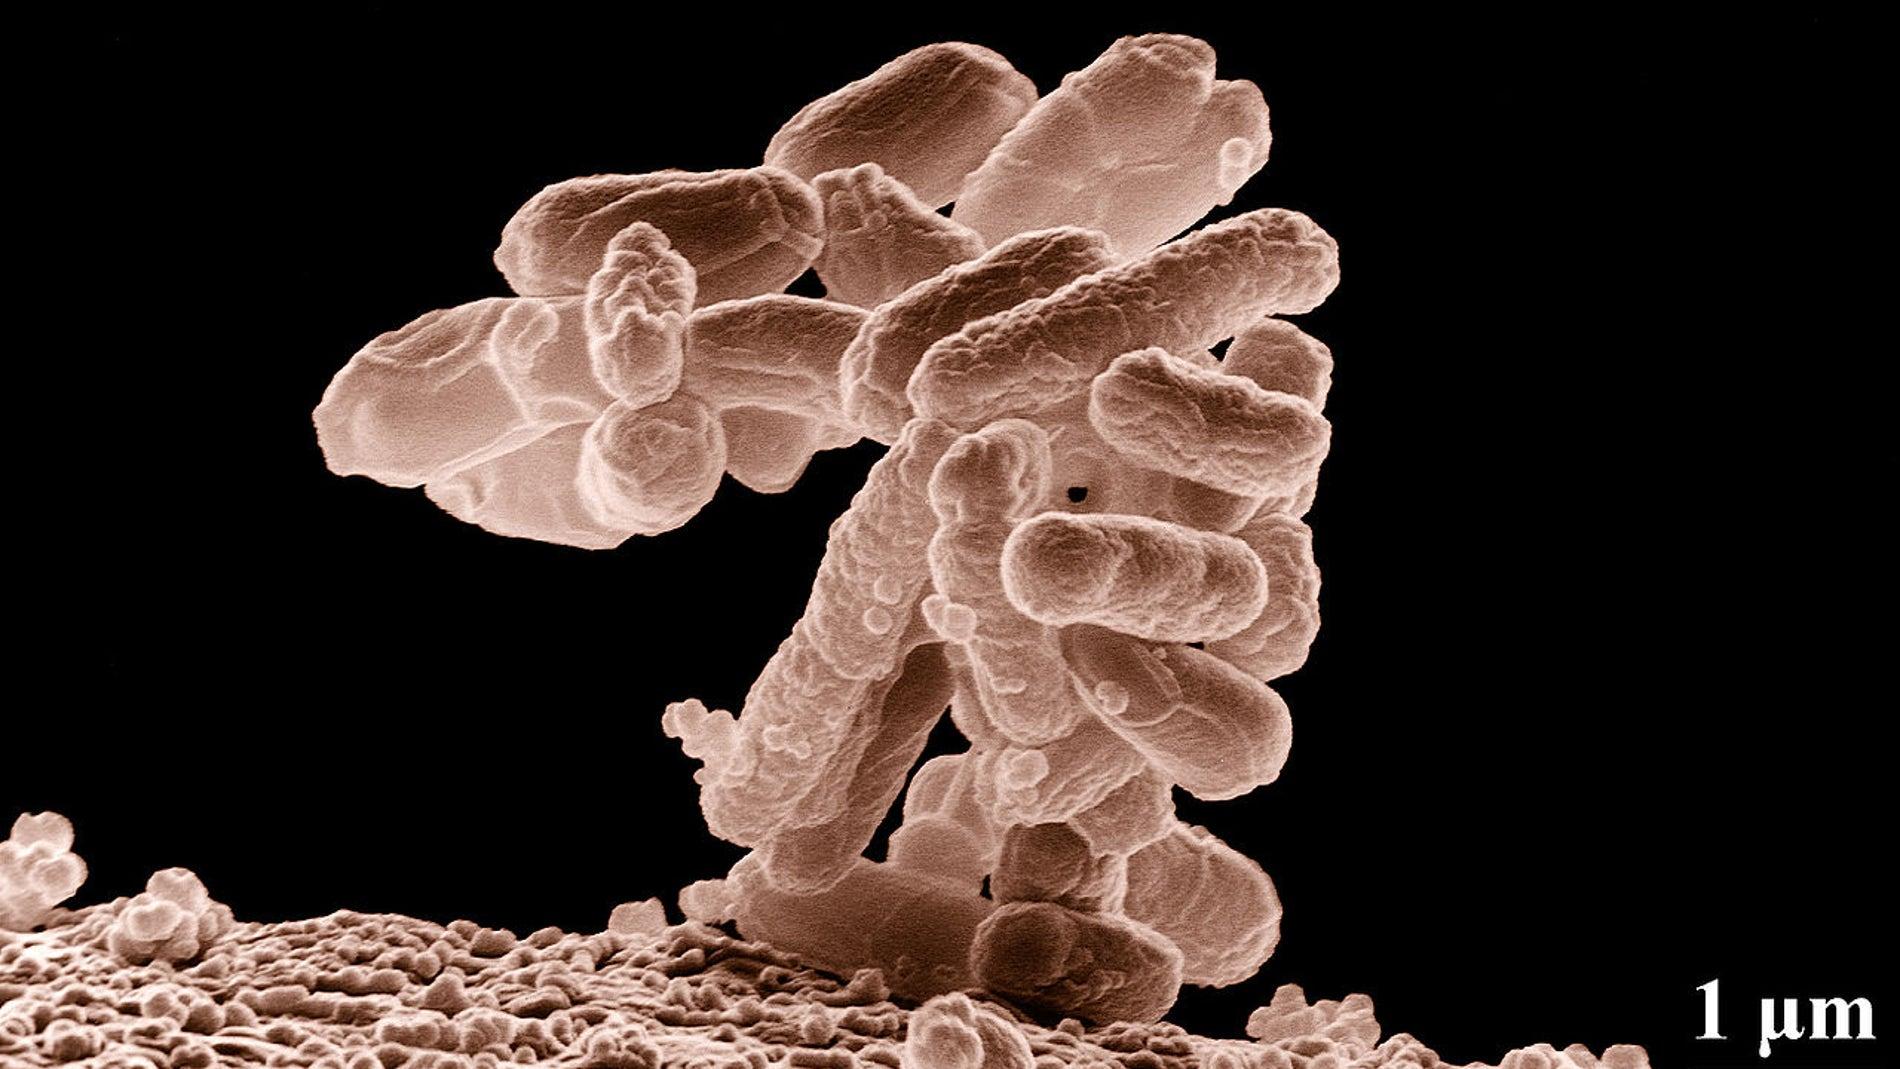 Micrografía electrónica de un cúmulo de bacterias E. coli ampliado cien mil veces